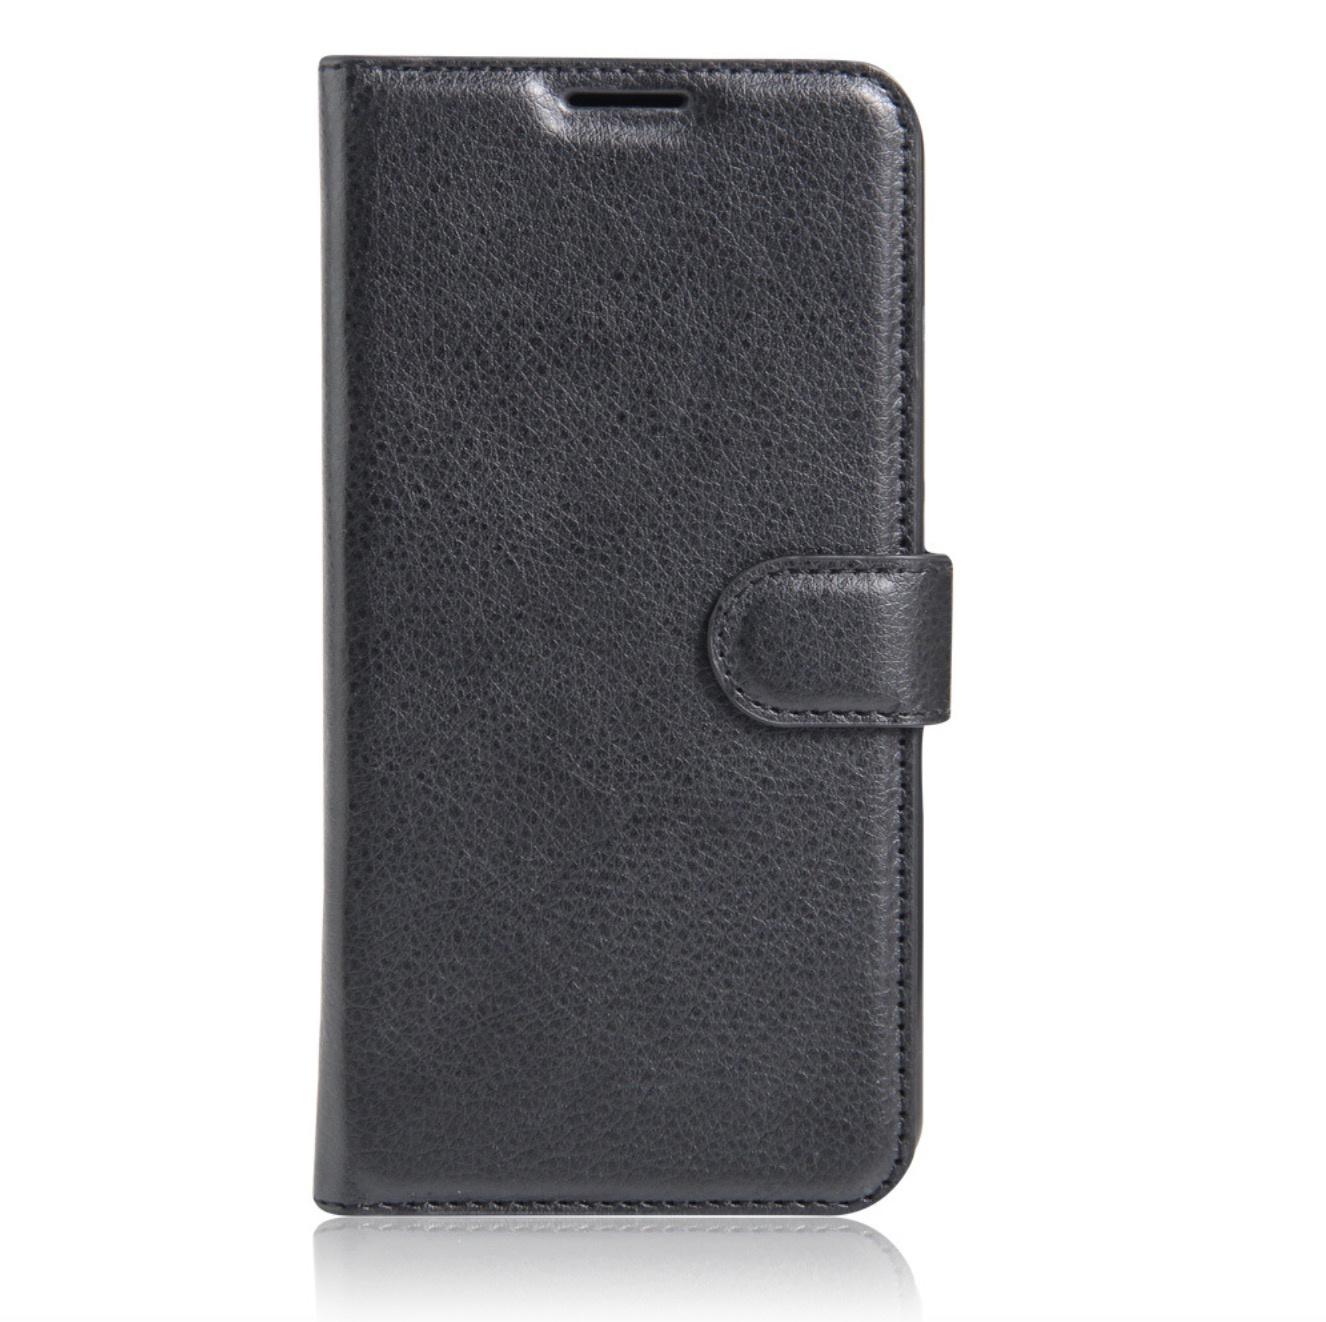 "Чехол MyPads для Lenovo Vibe Z2 mini K920 5.5"" с мульти-подставкой застёжкой и визитницей черный"